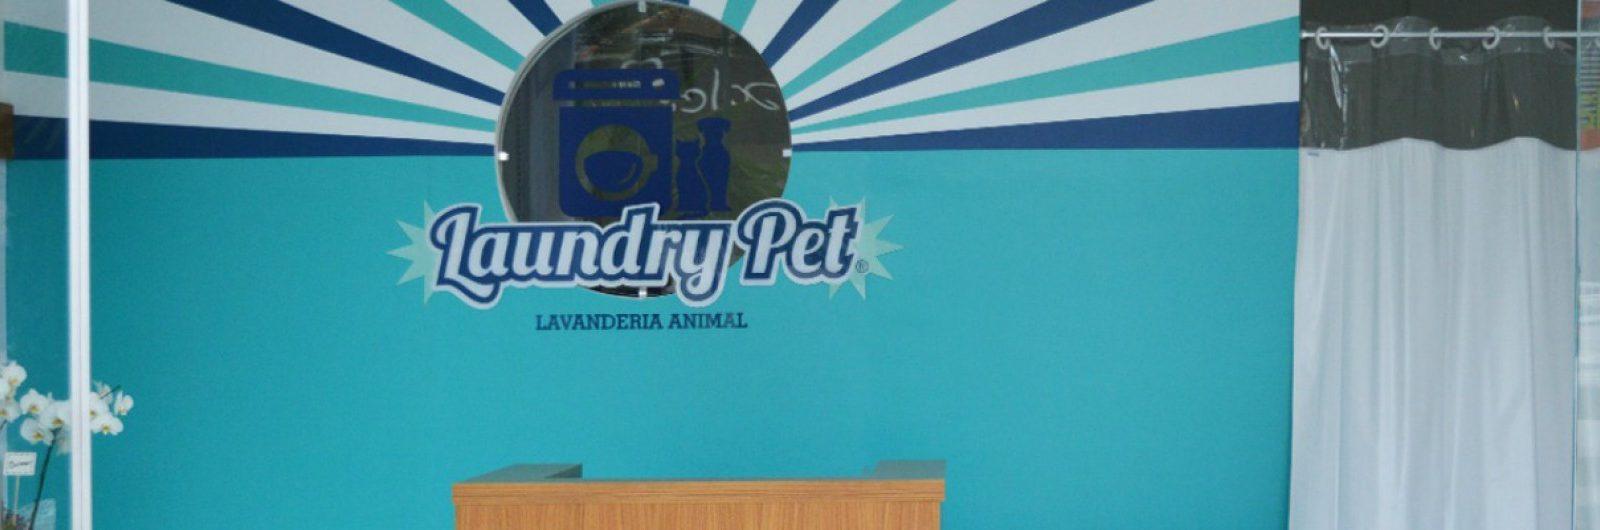 Laundry Pet